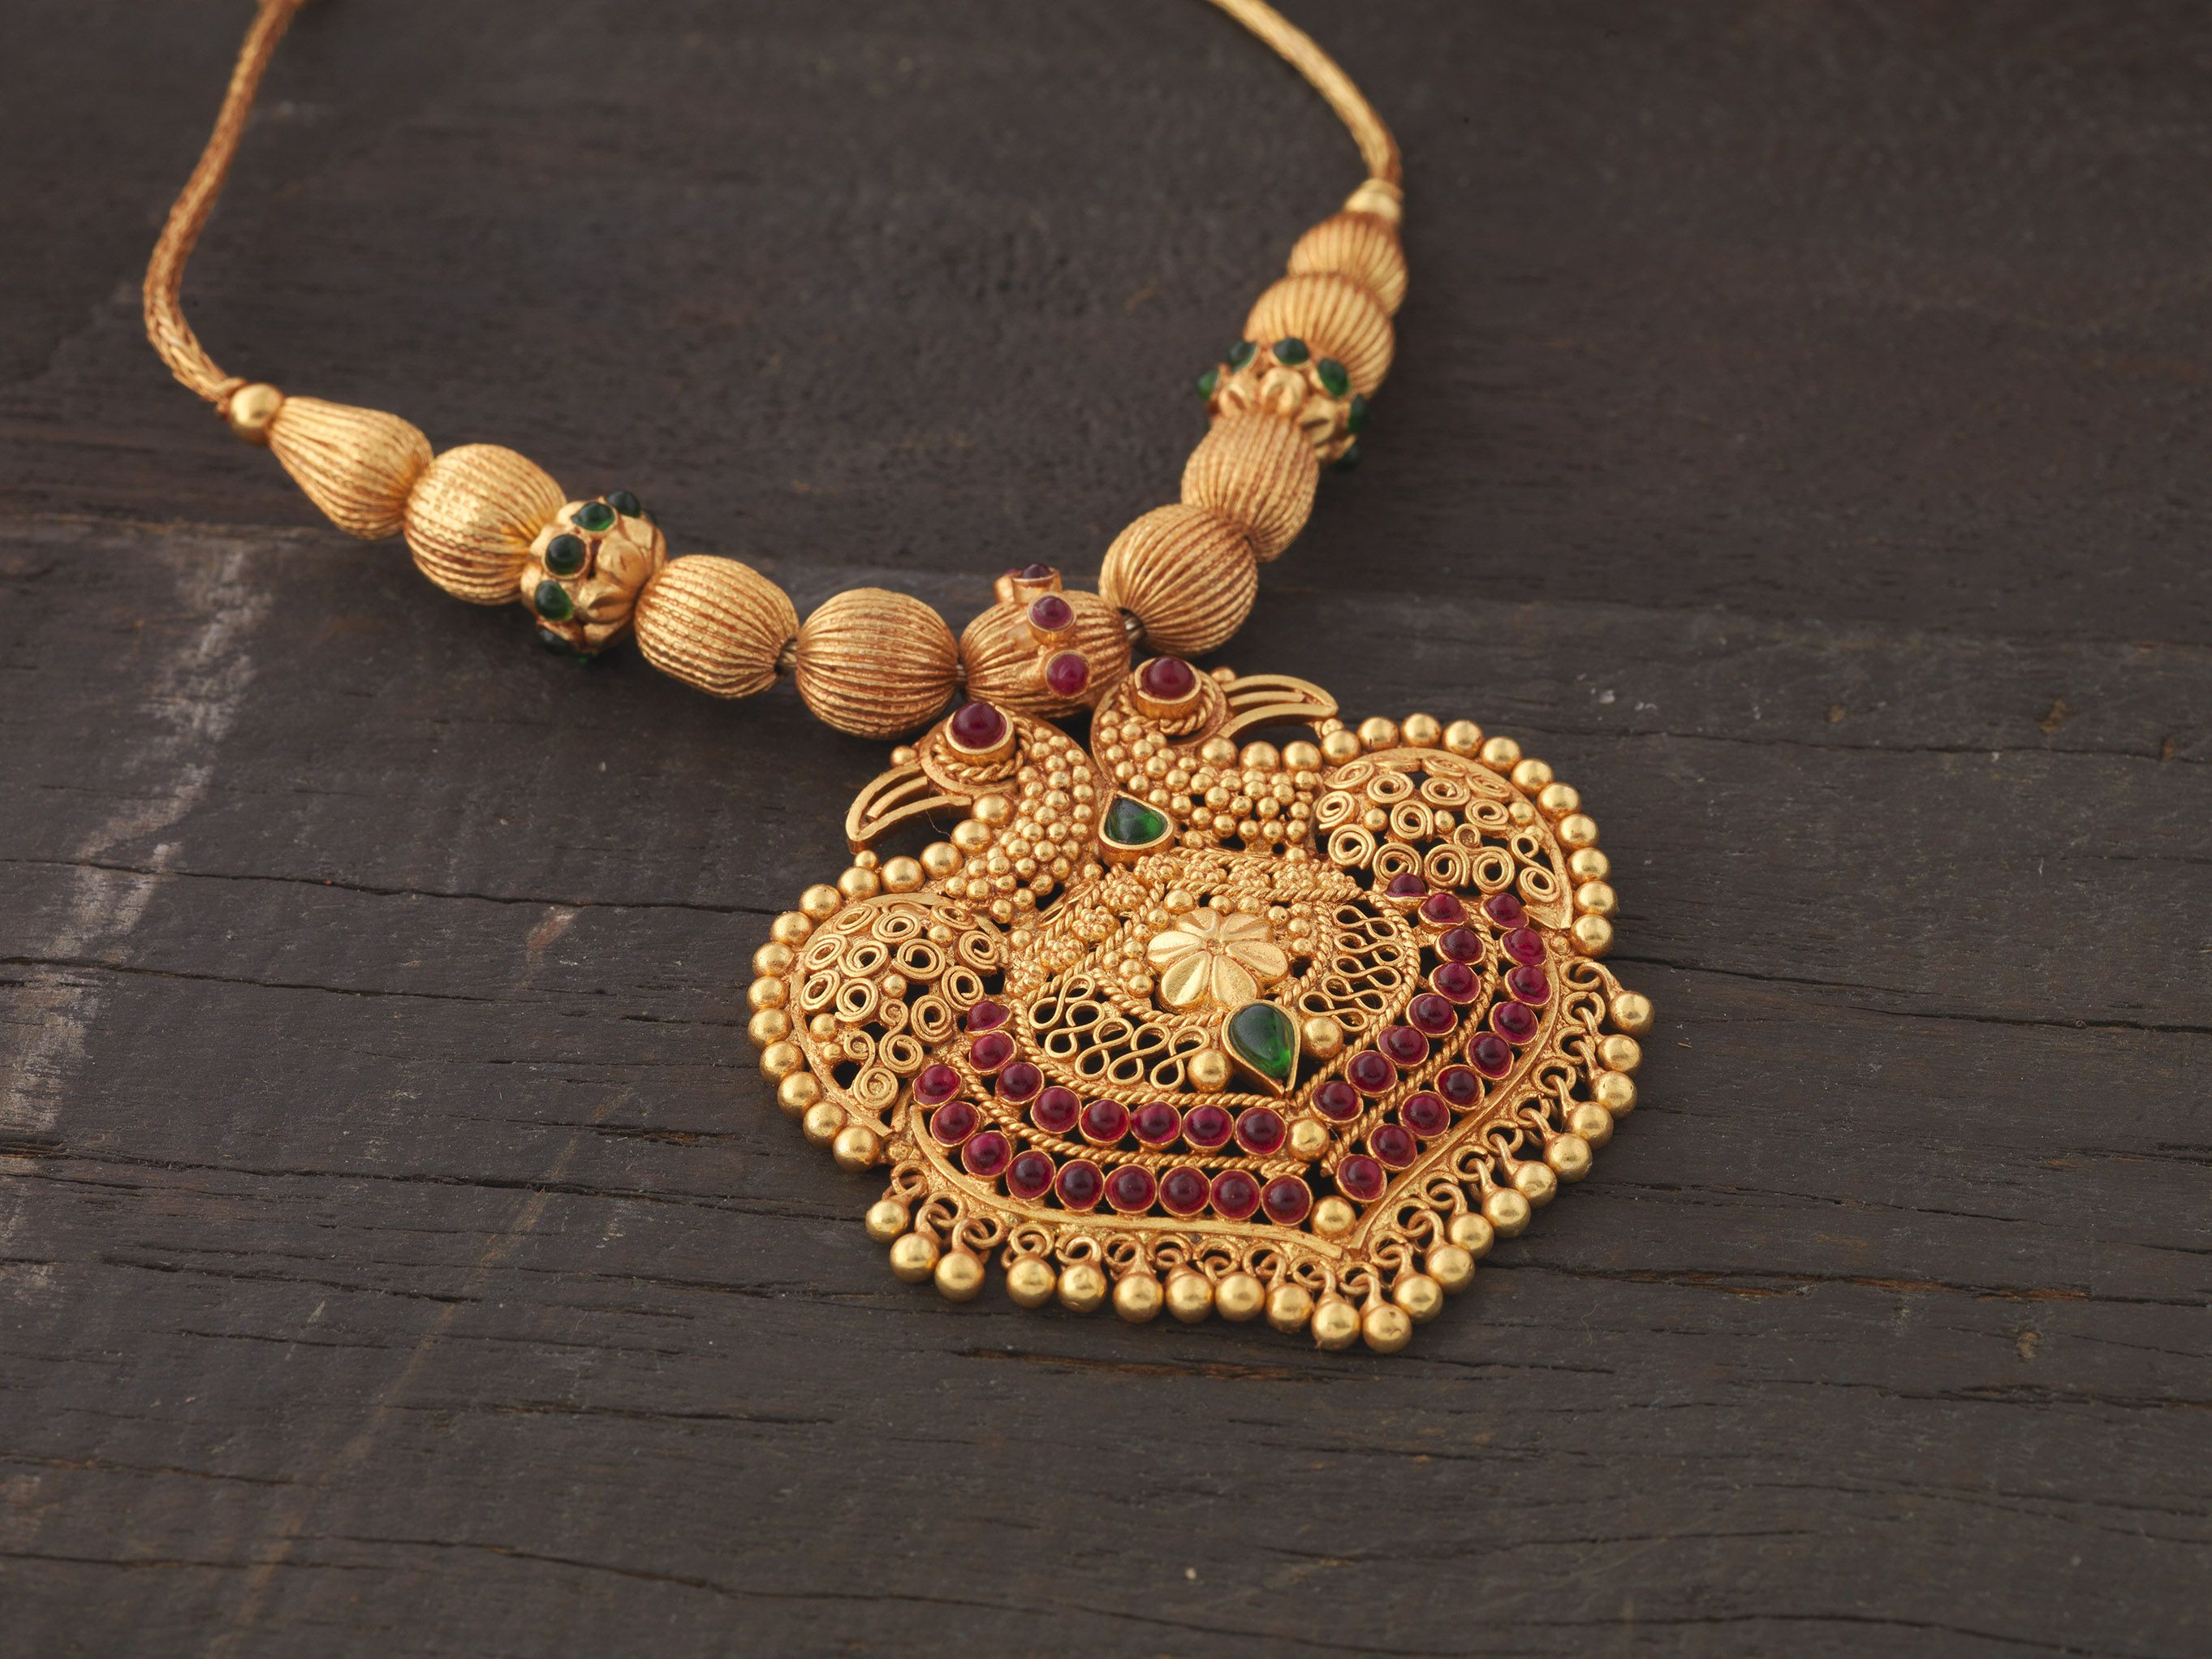 Pai jewellers gold necklace designs latest indian jewellery designs - Silver Temple Jewellery With Gandaberunda Pendant Temple Jewellerybridal Jewellerygold Jewelleryfashion Jewelleryjewellery Designsgold Designsindian